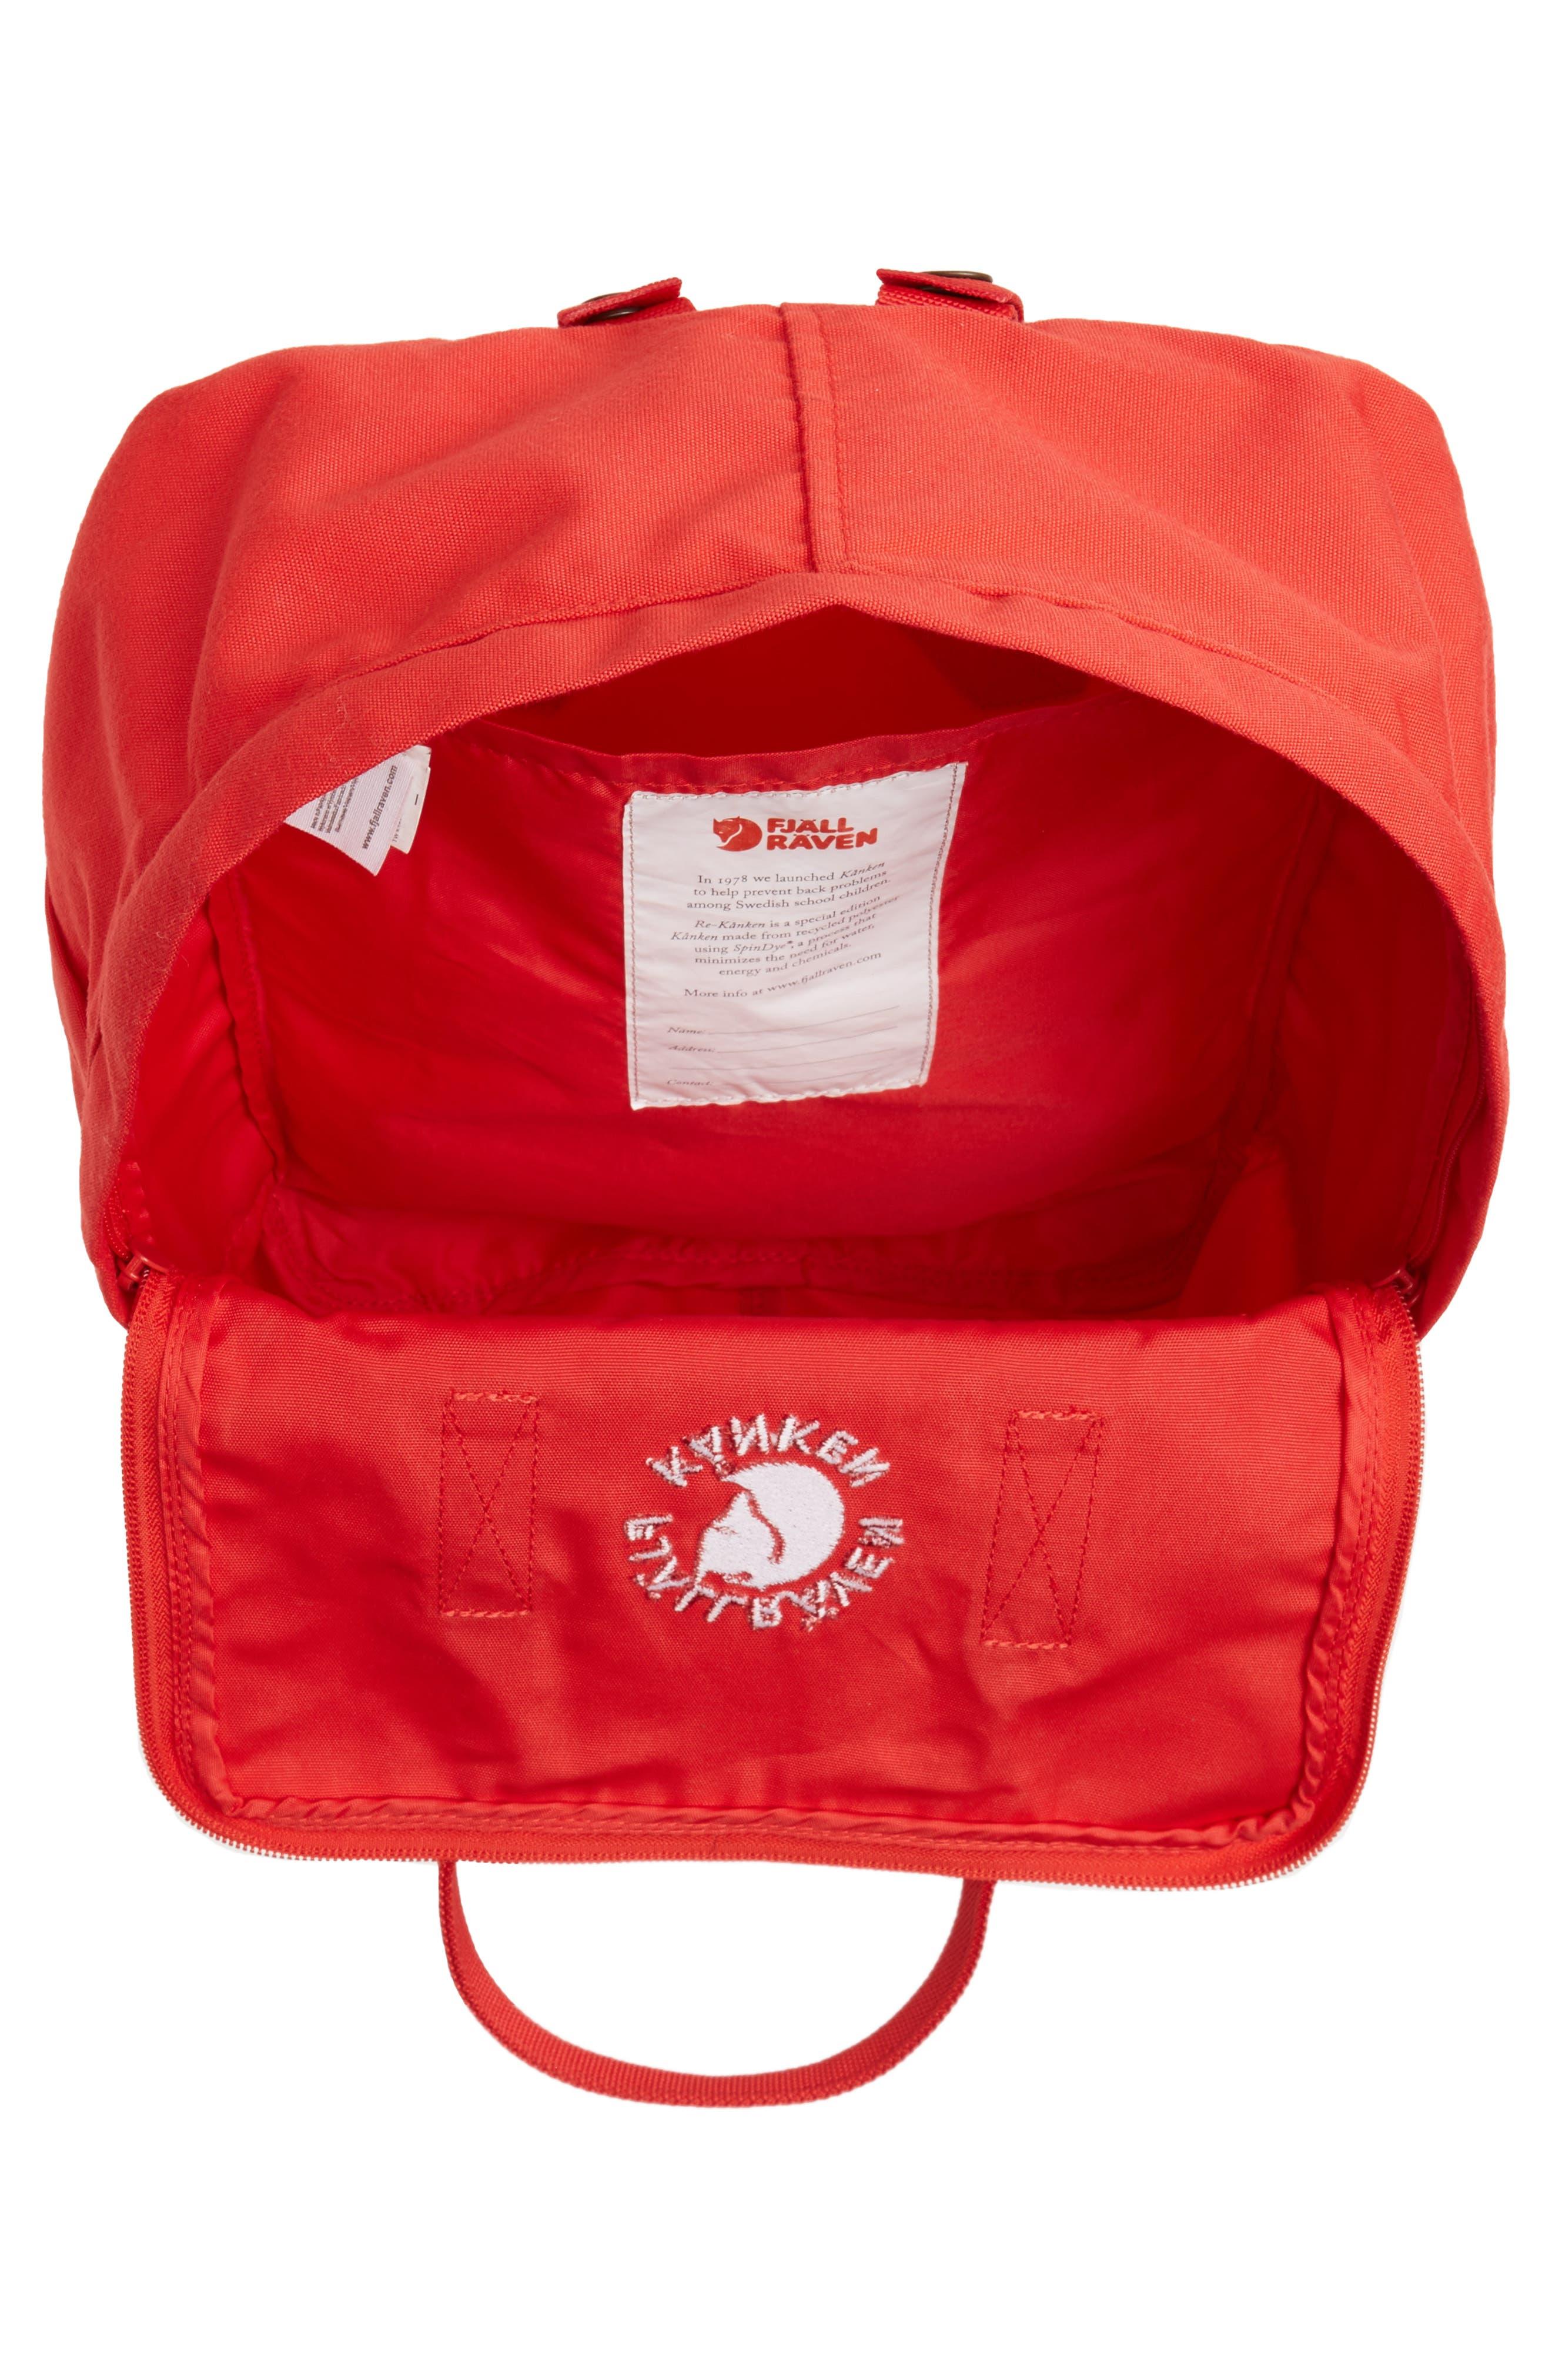 Re-Kånken Water Resistant Backpack,                             Alternate thumbnail 4, color,                             Red